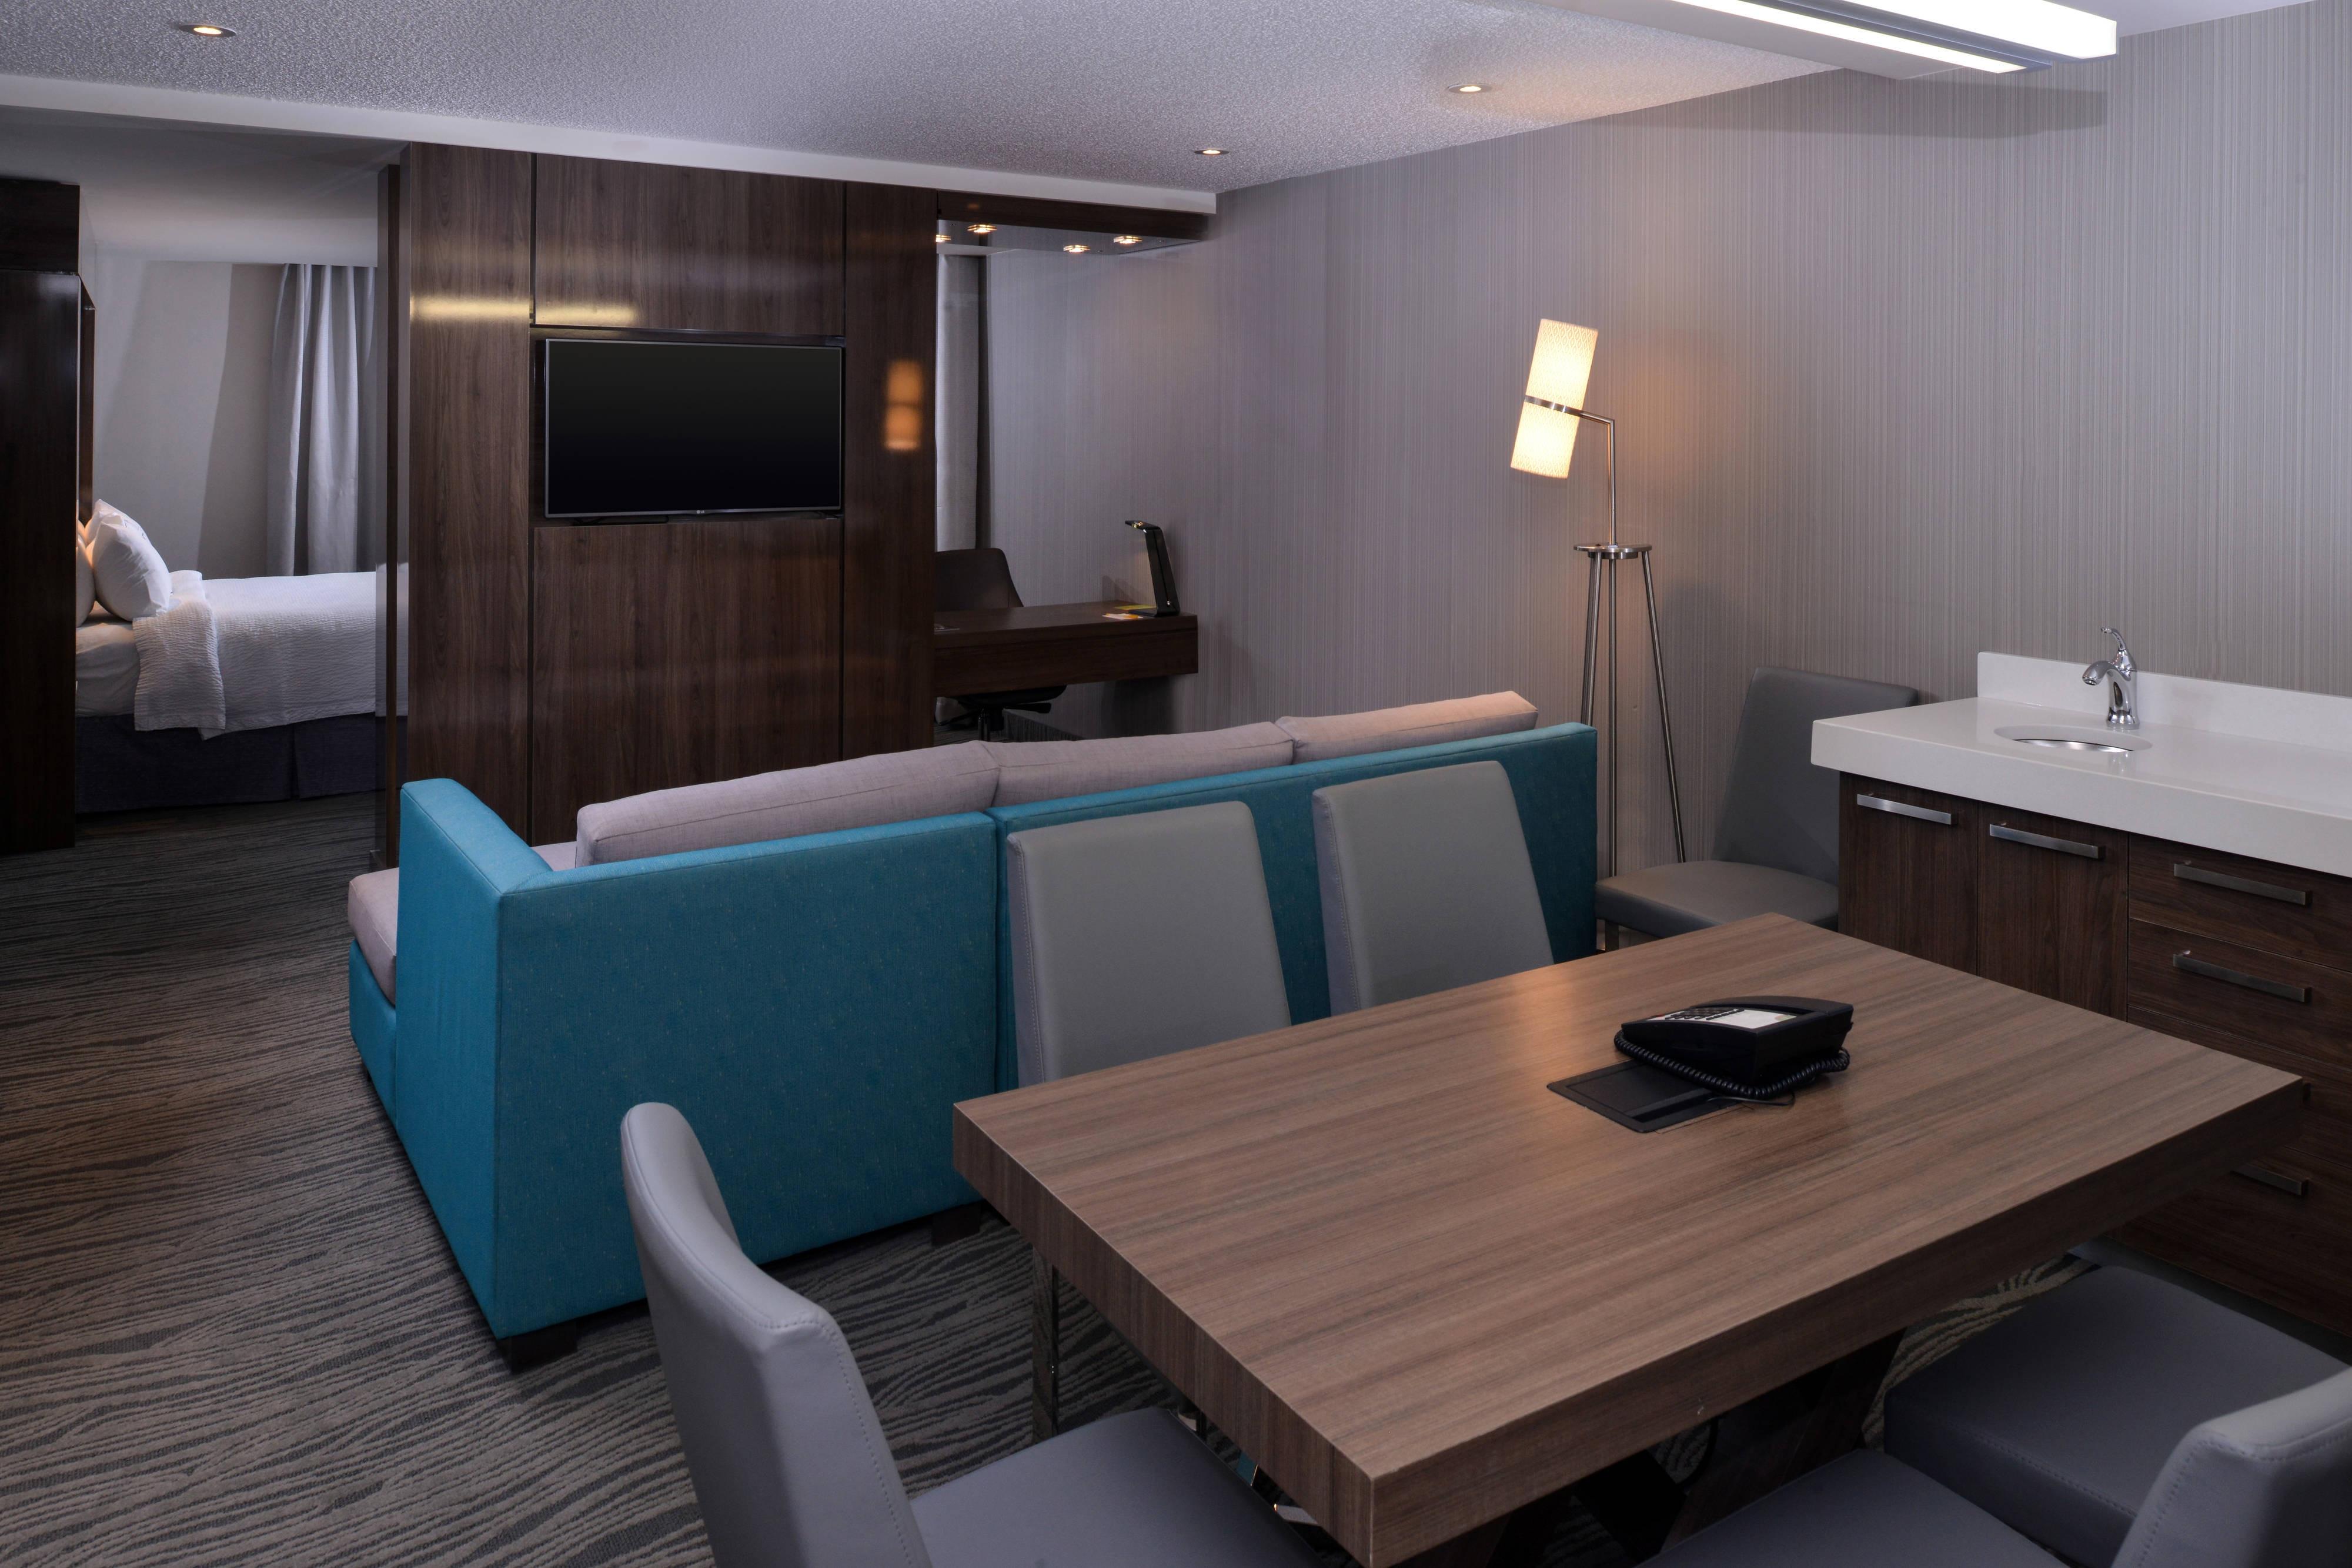 King Studio King Suite Executive Meeting Table